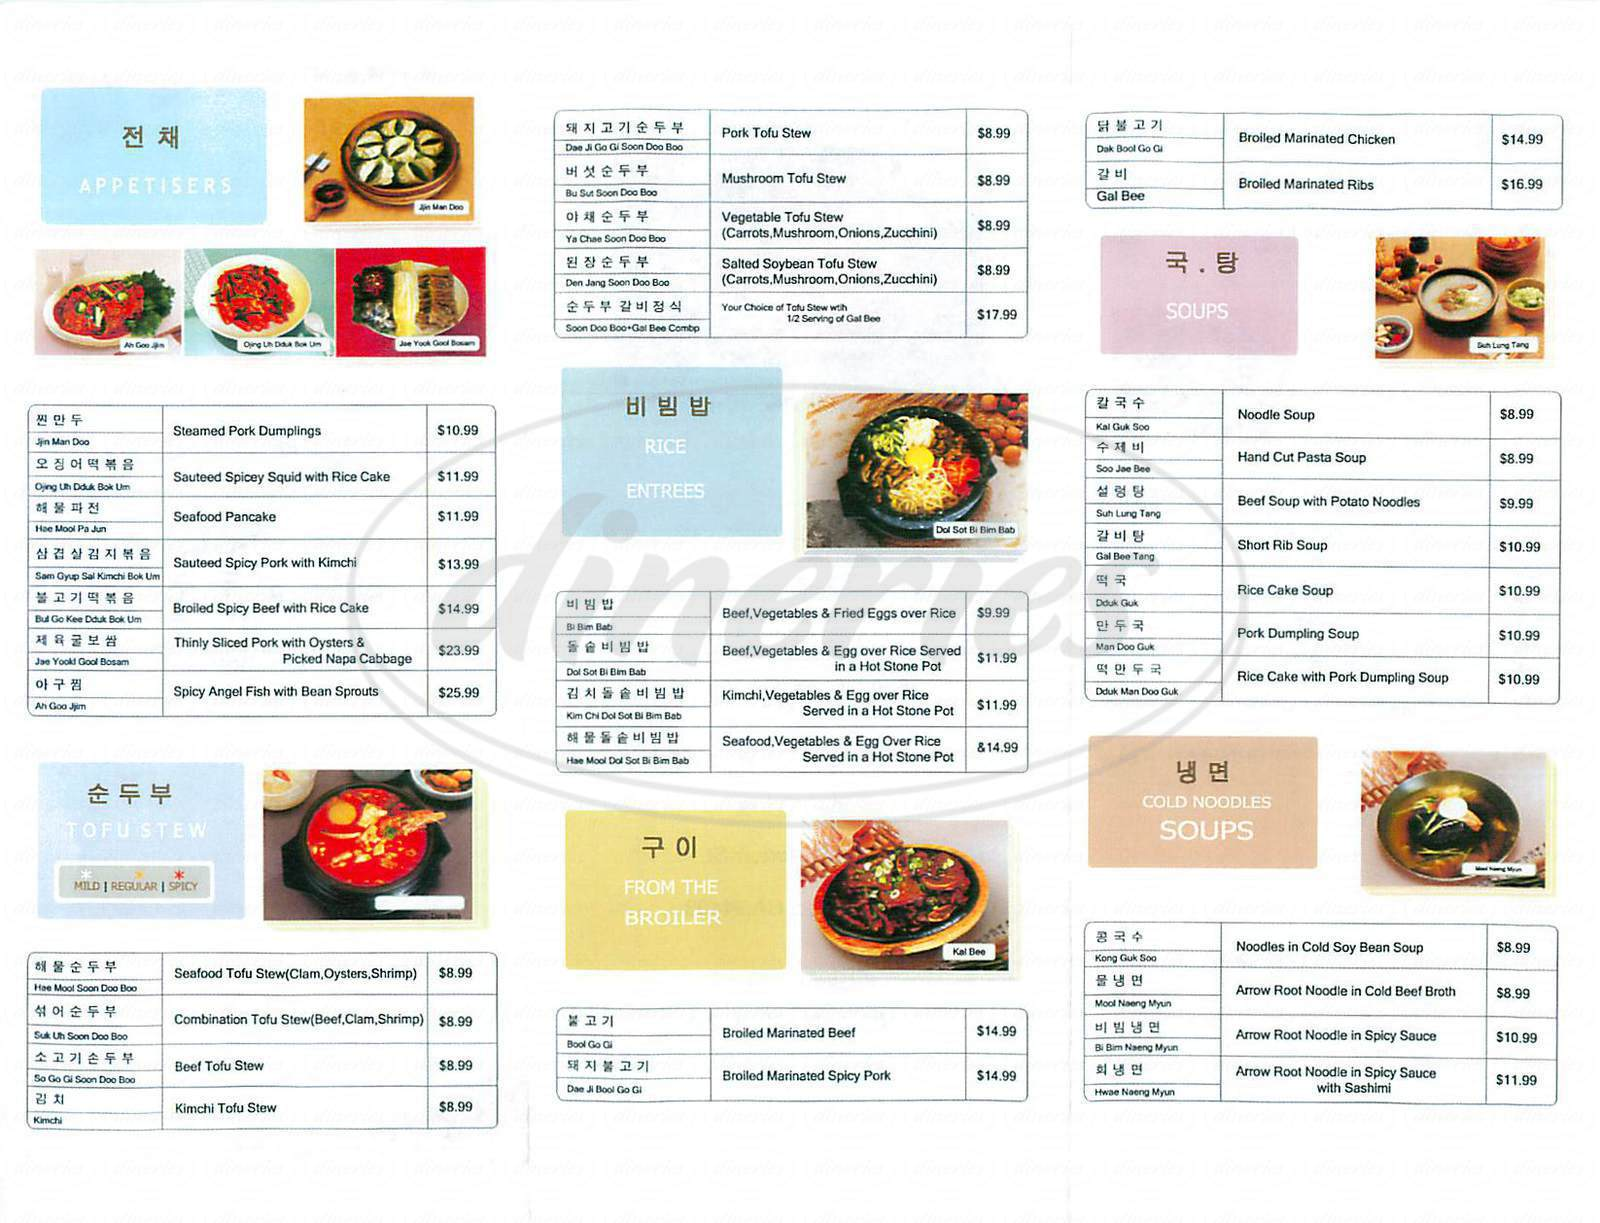 menu for Myung Dong Tofu Cabin